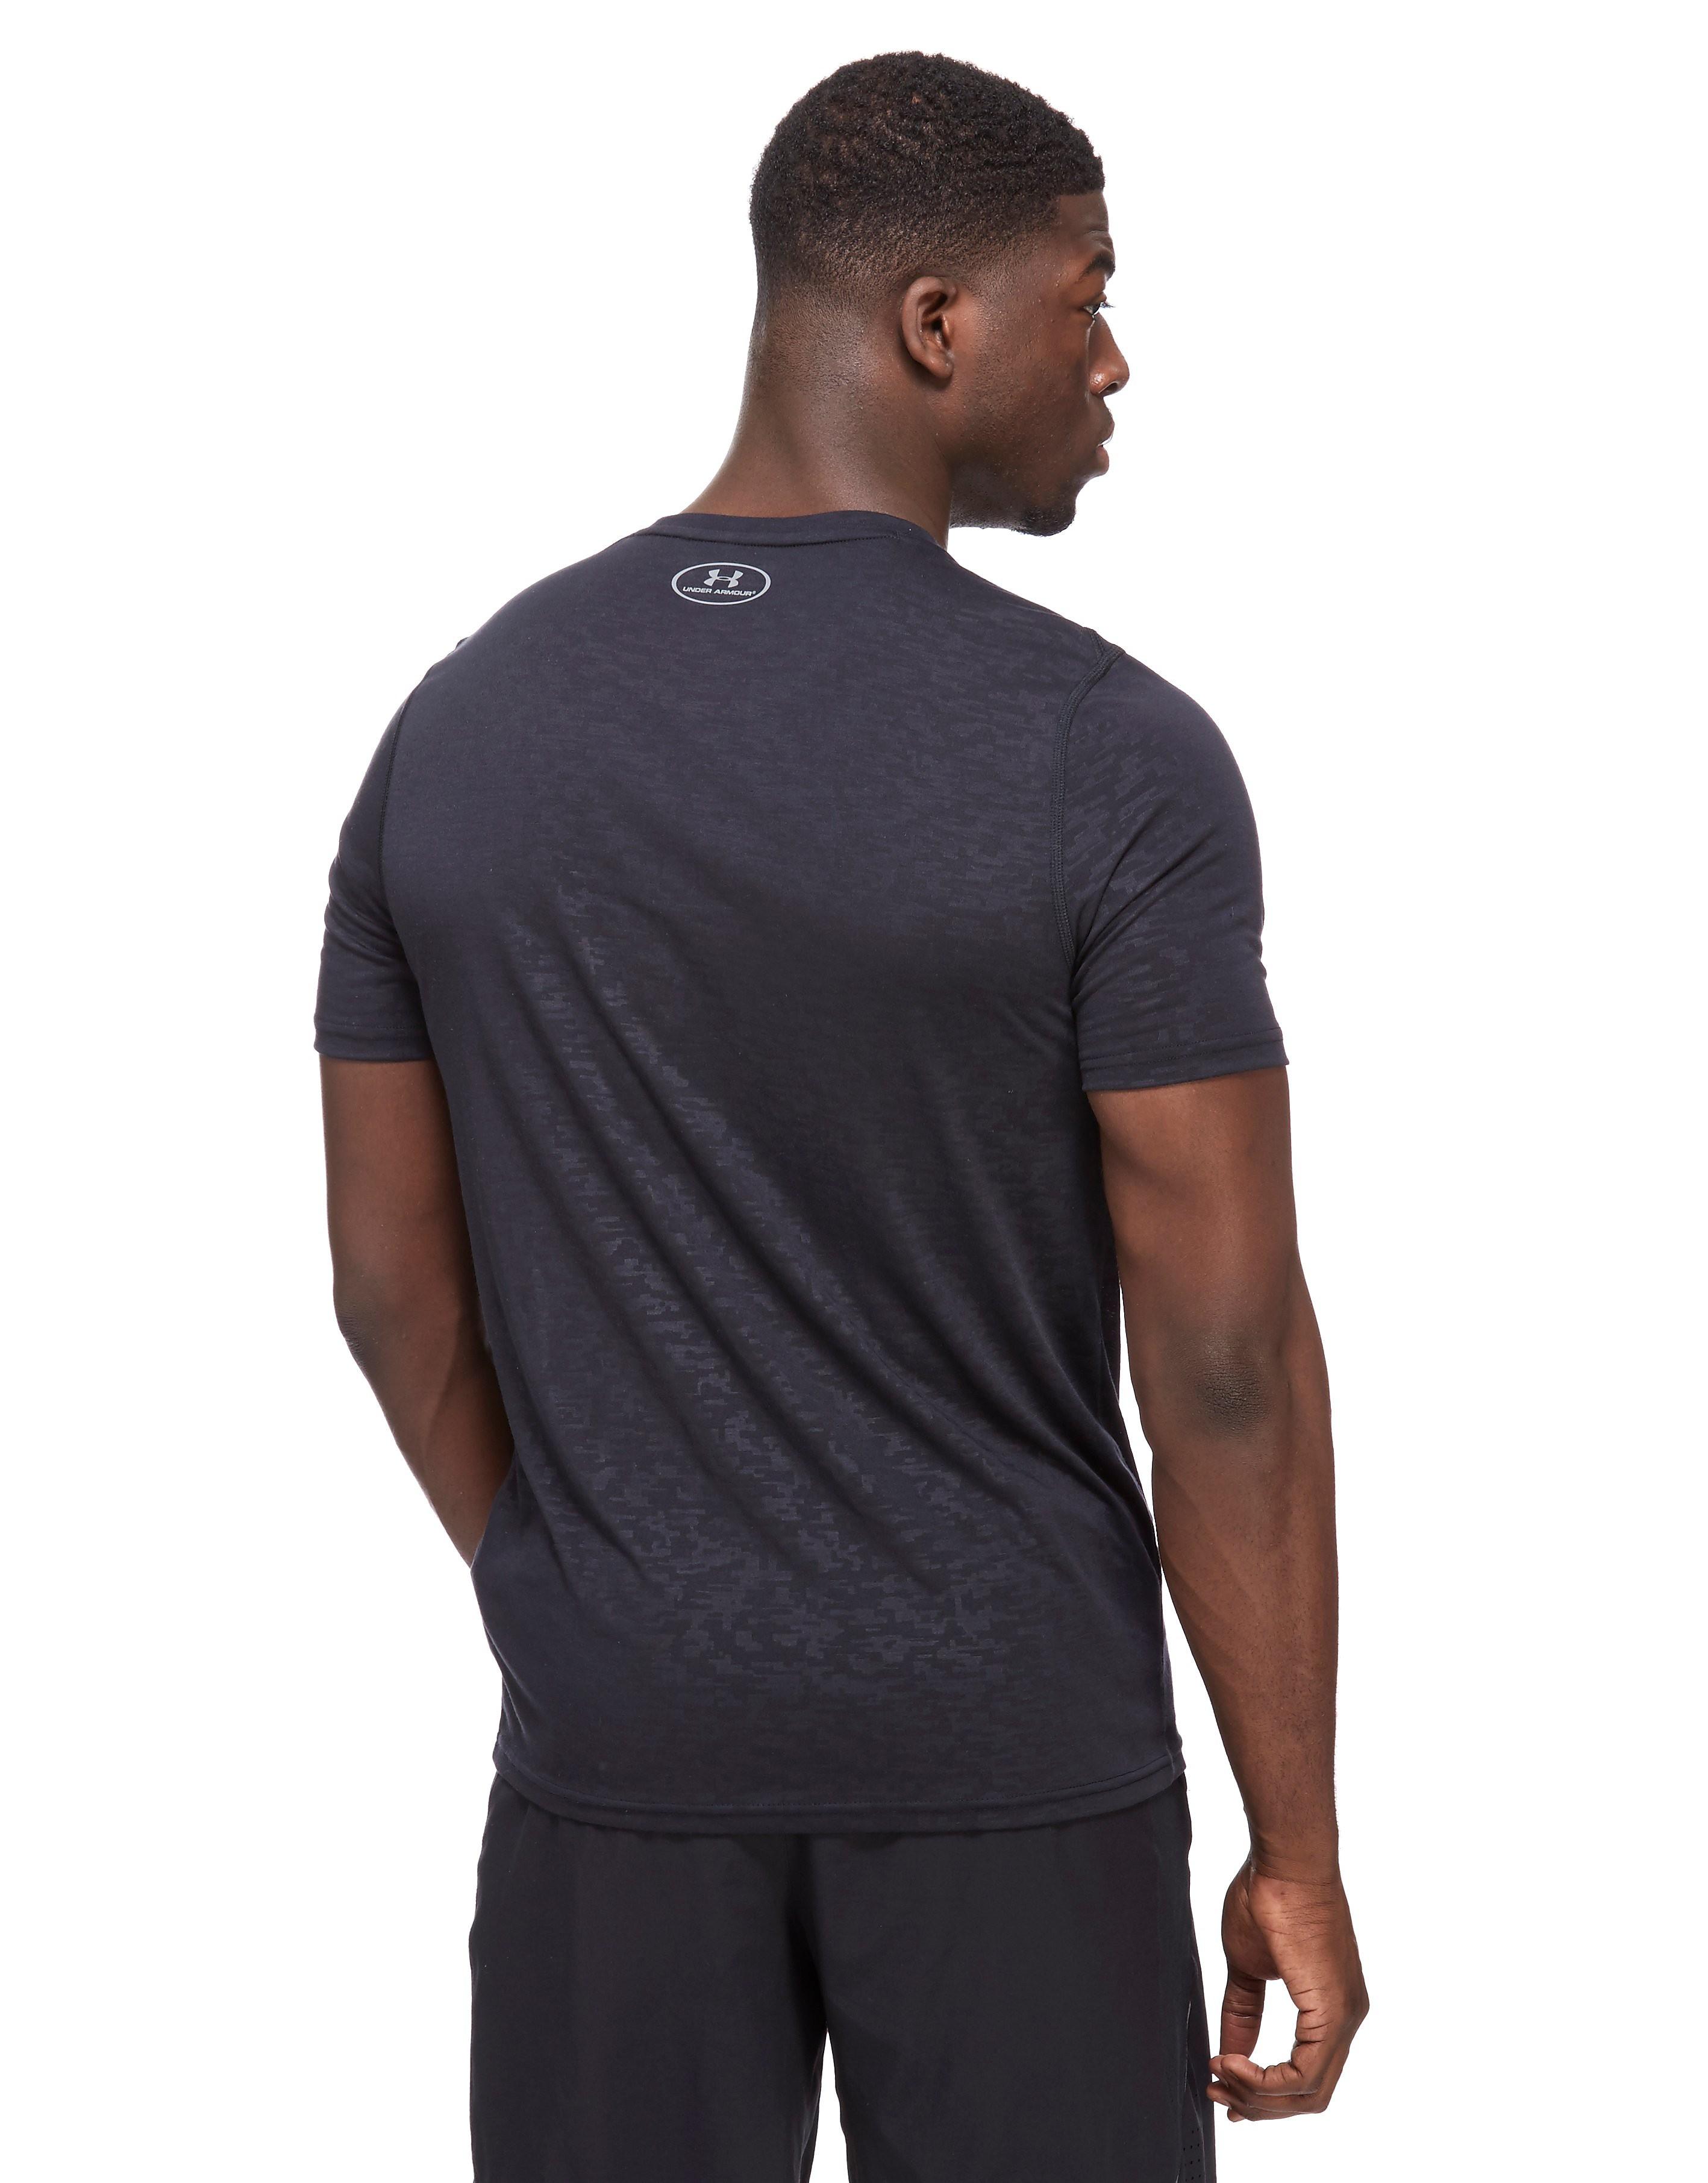 Under Armour Threadborne Jacquard T-shirt